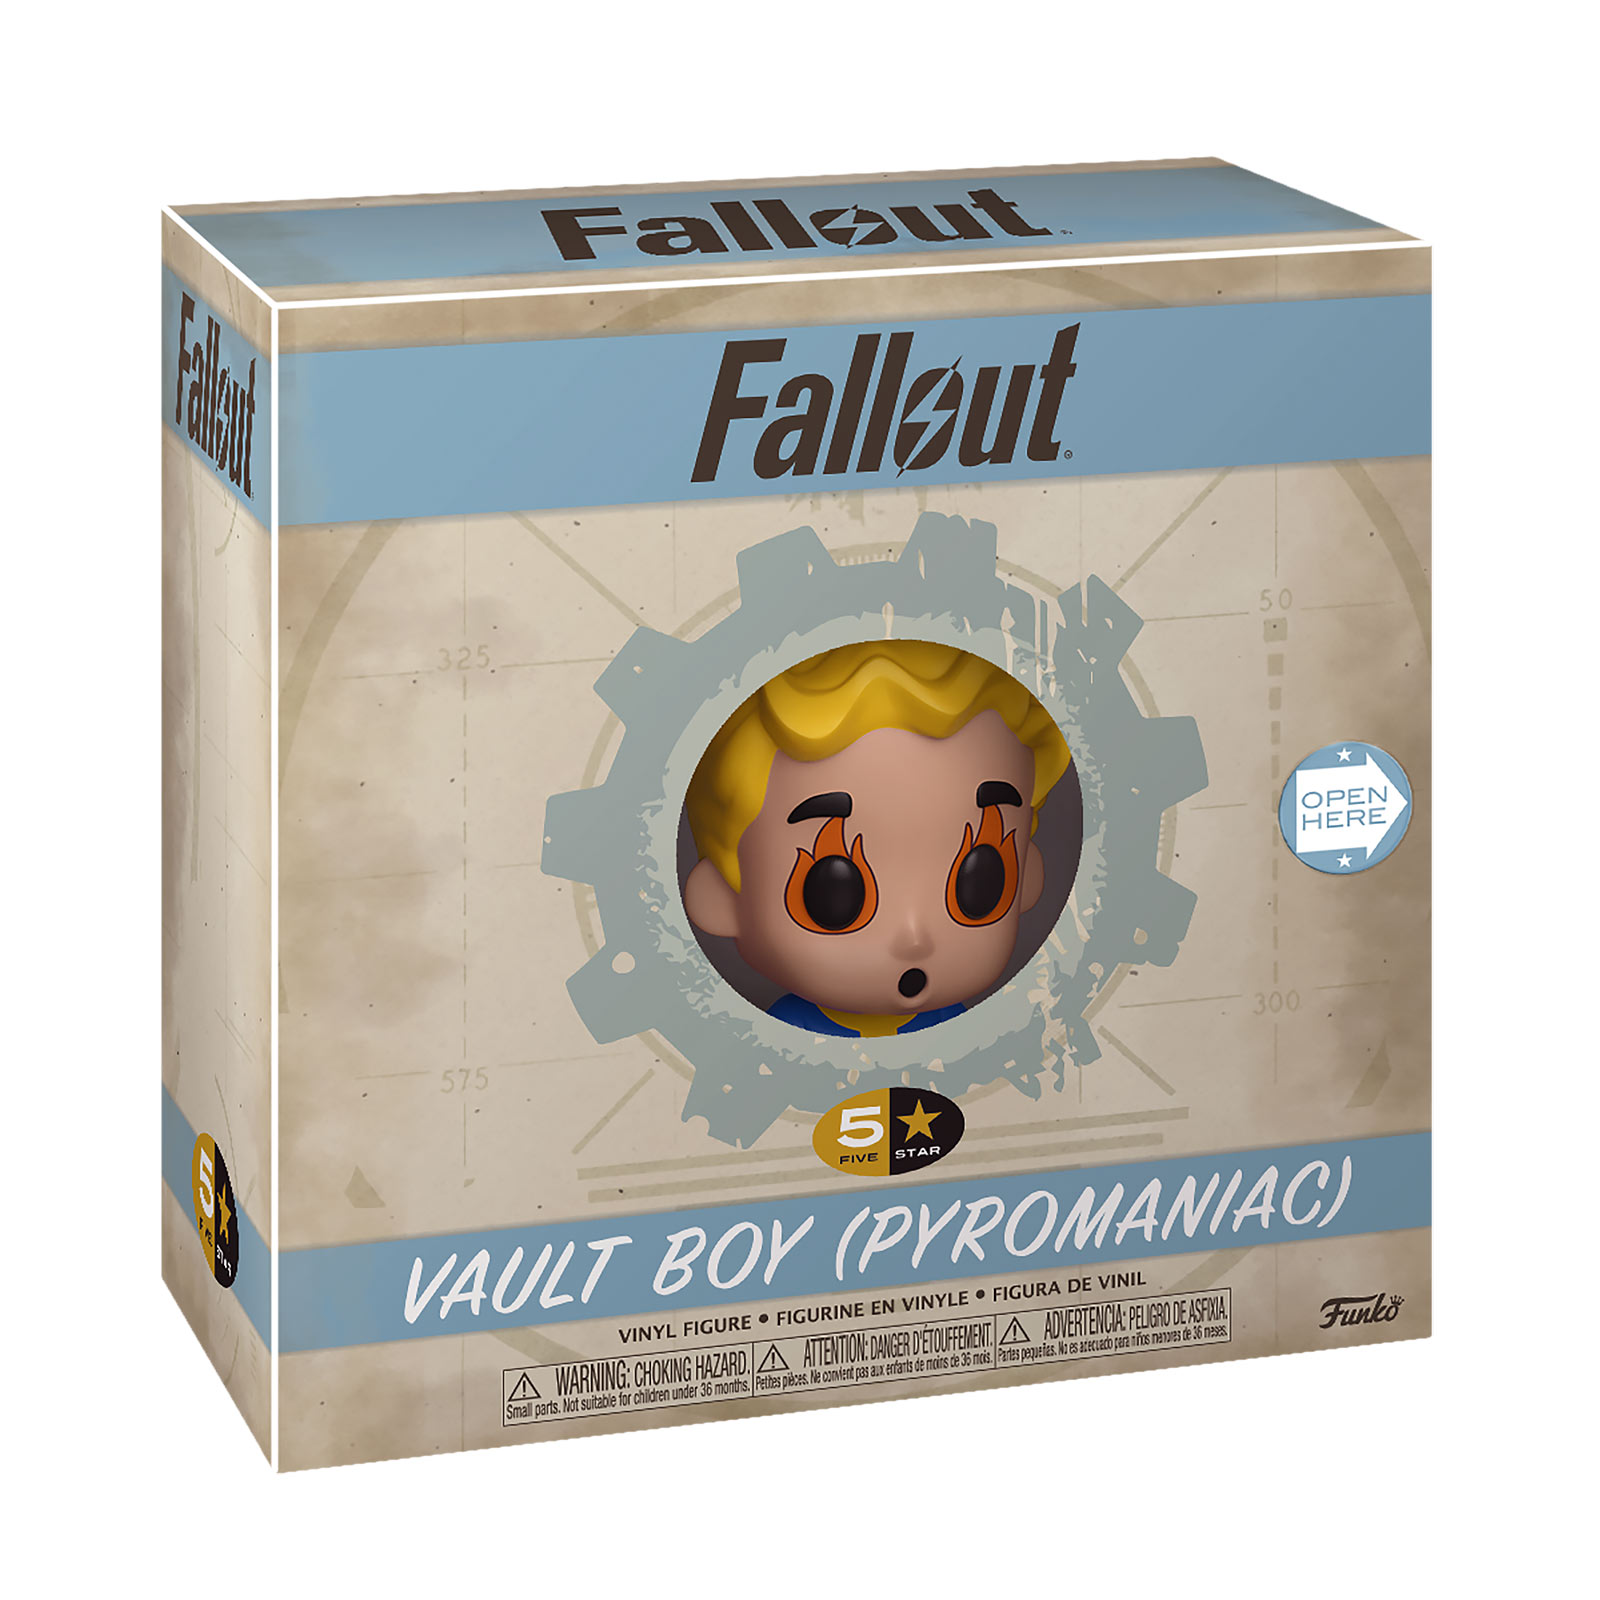 Fallout - Vault Boy Pyromaniac Funko Five Star Figur